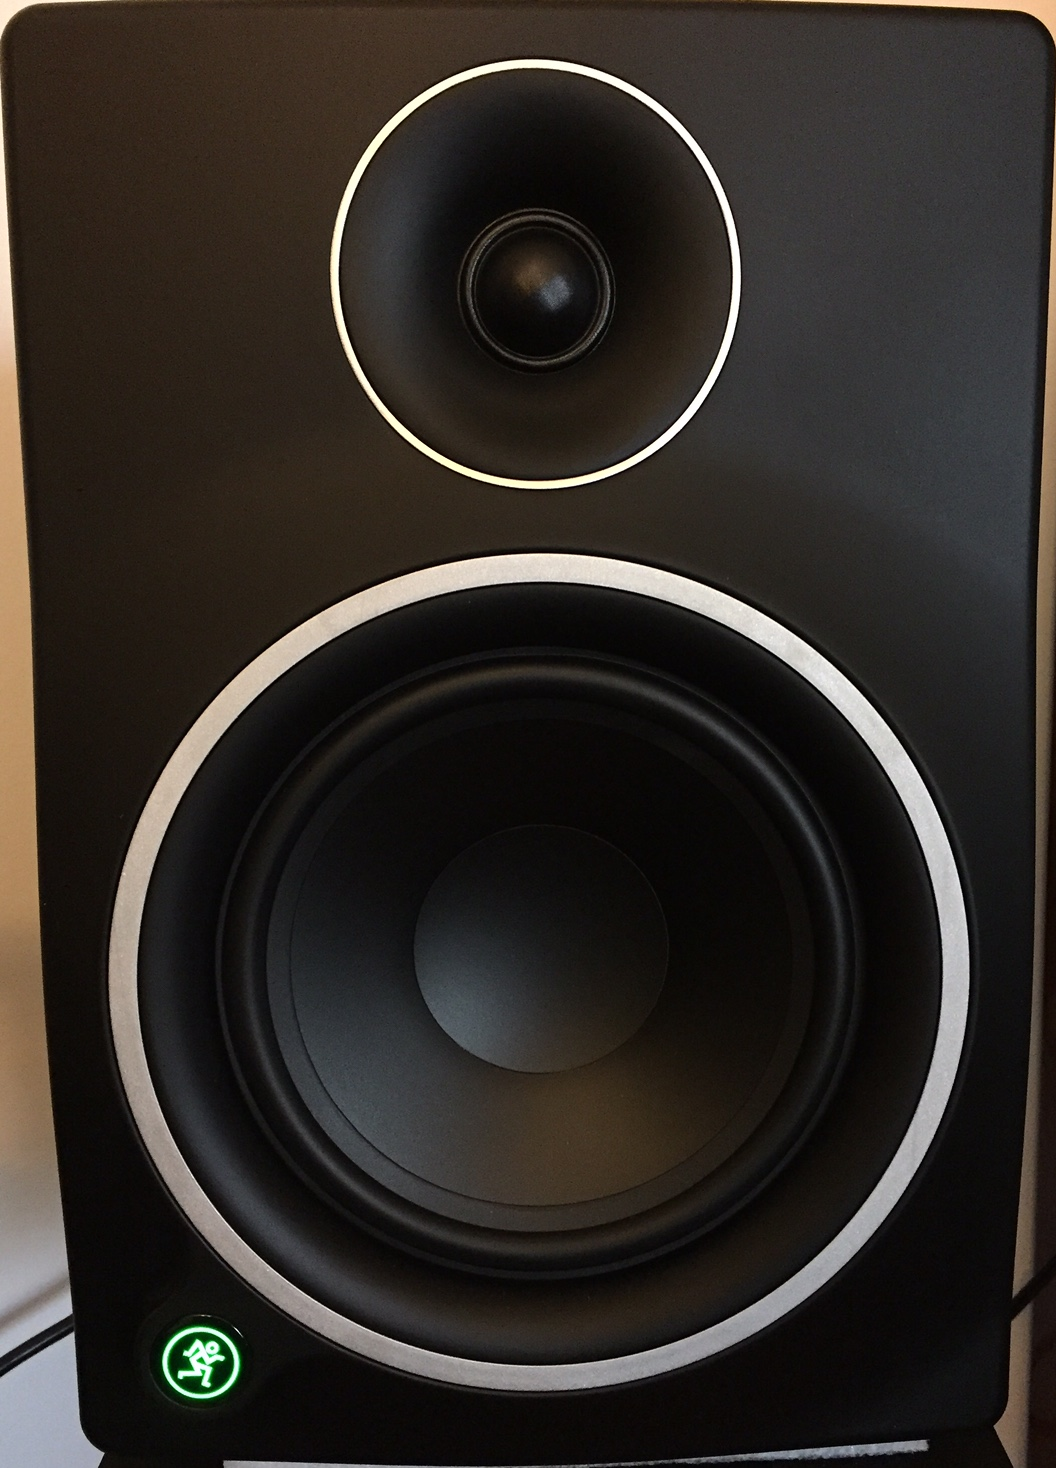 Mackie MR6mk3 studio monitors, personal (subjective) review | Super